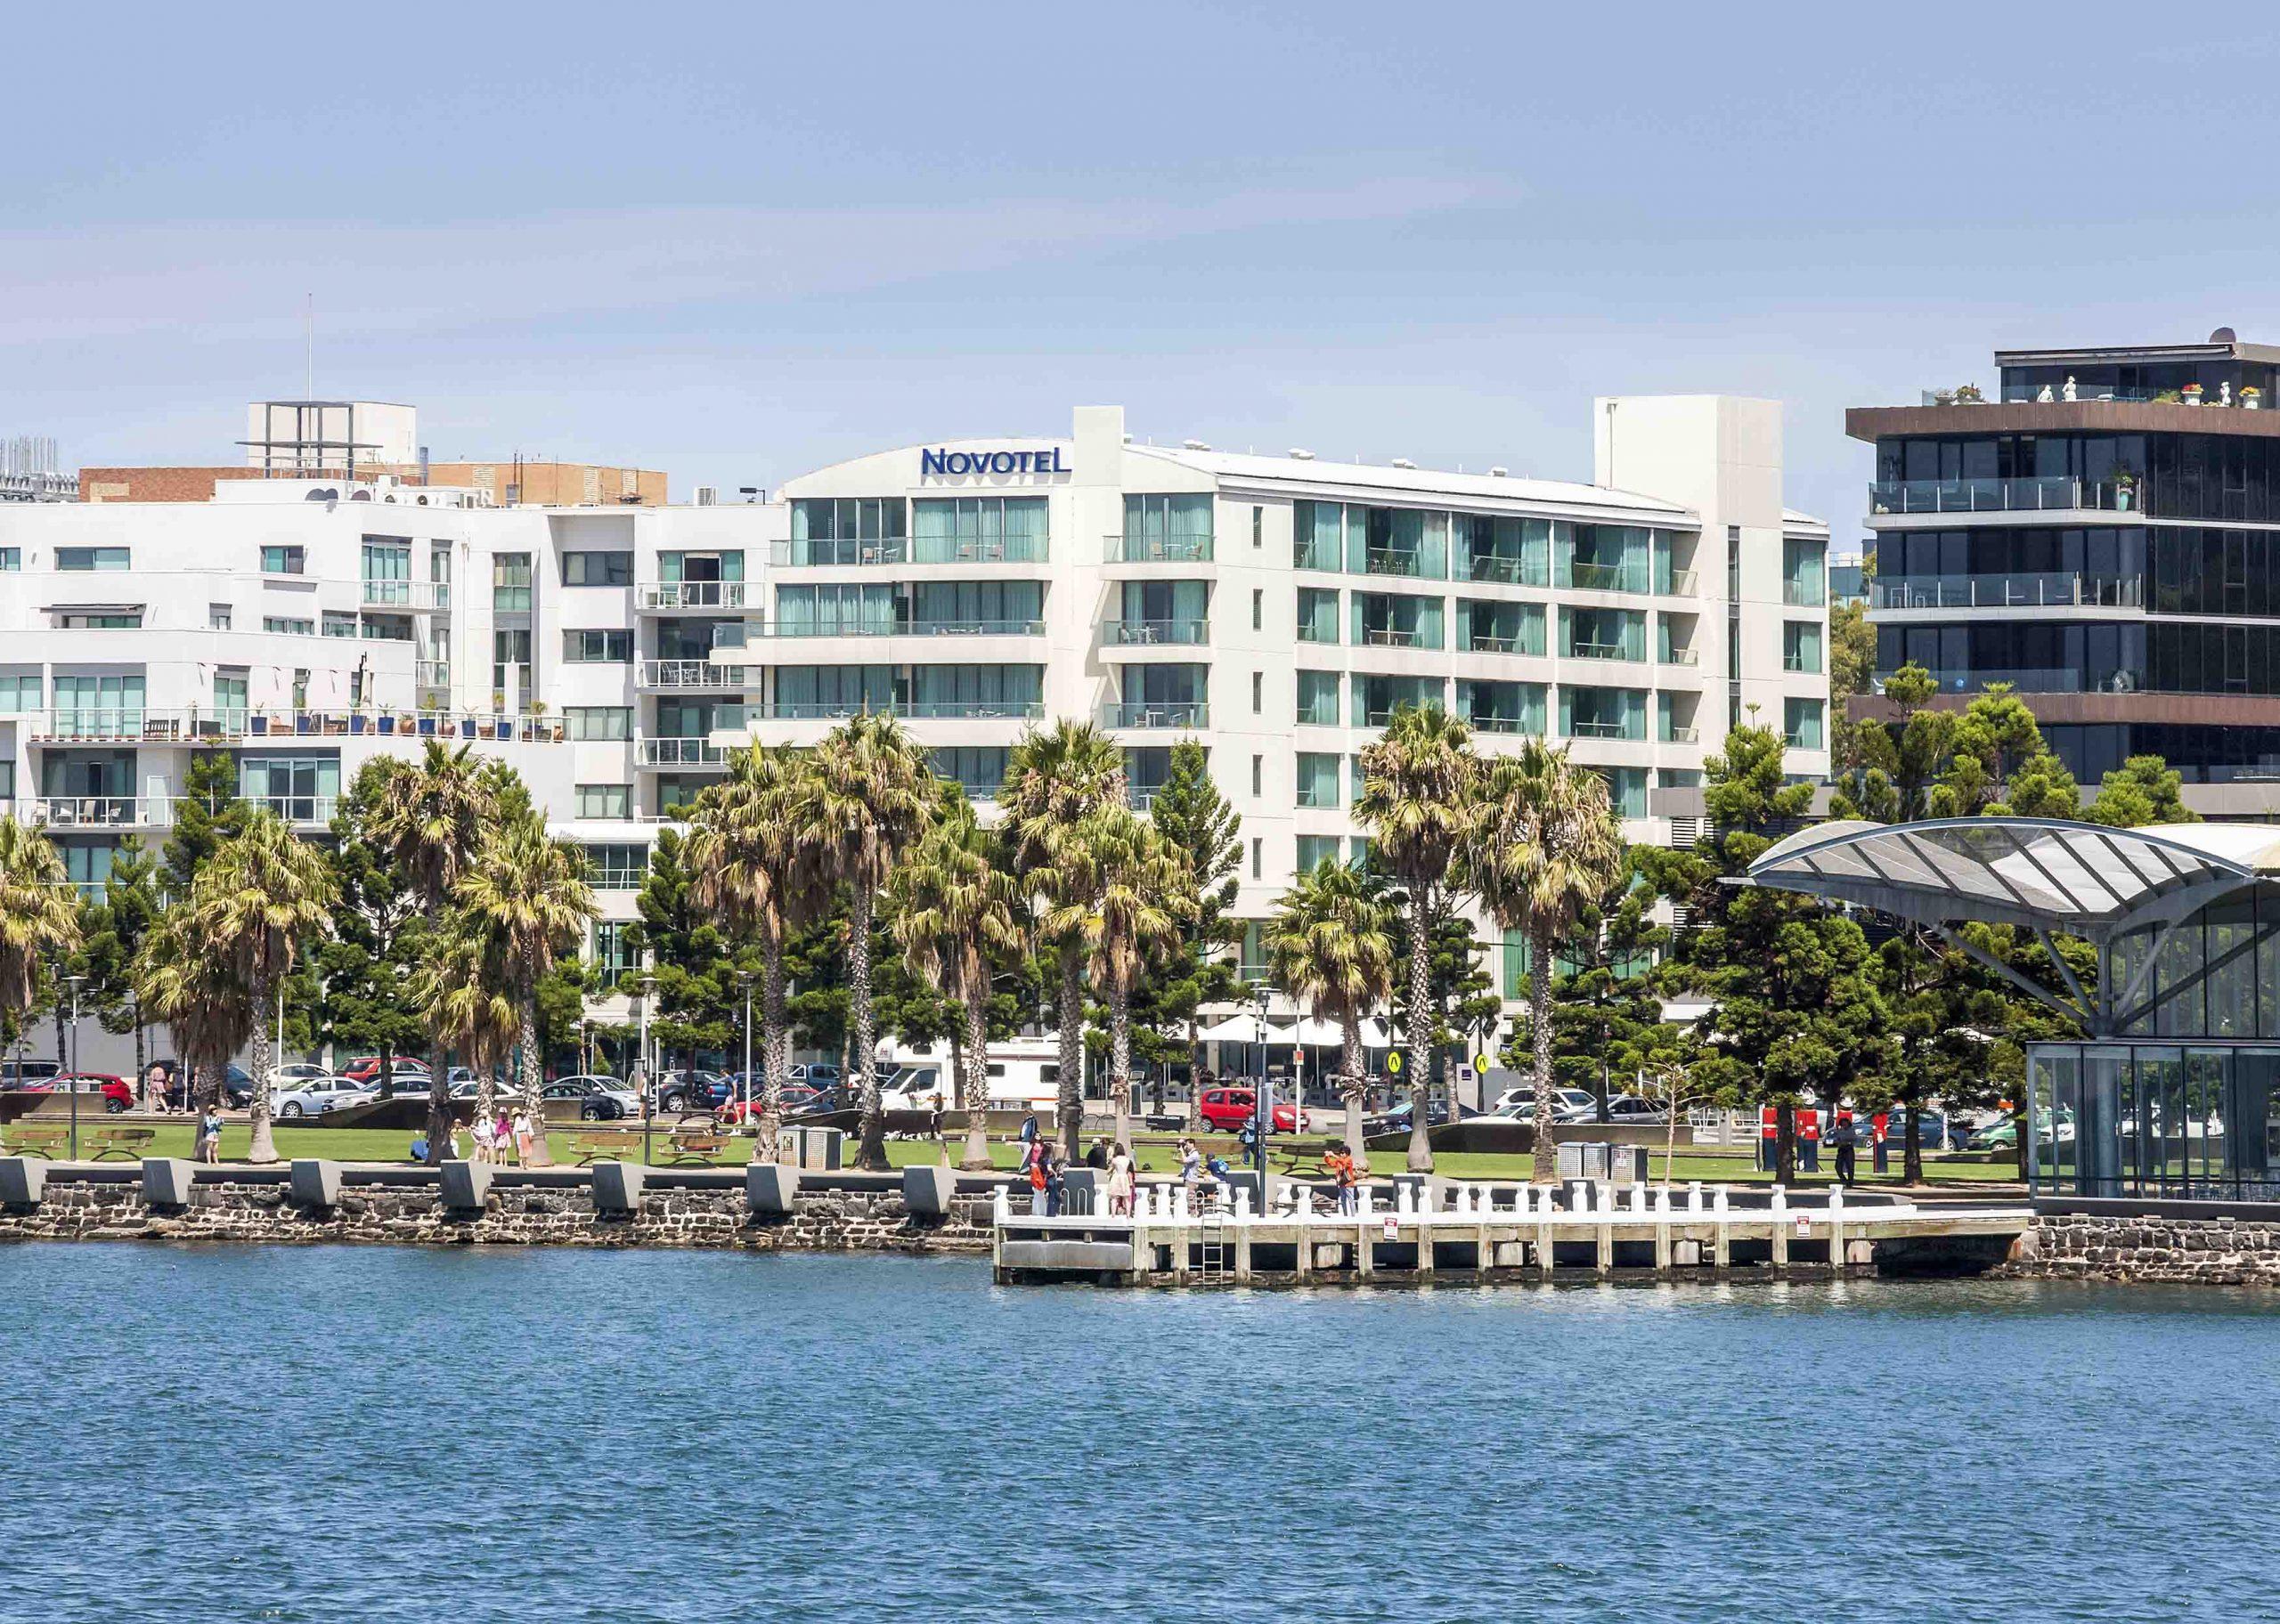 Novotel Geelong. Australia